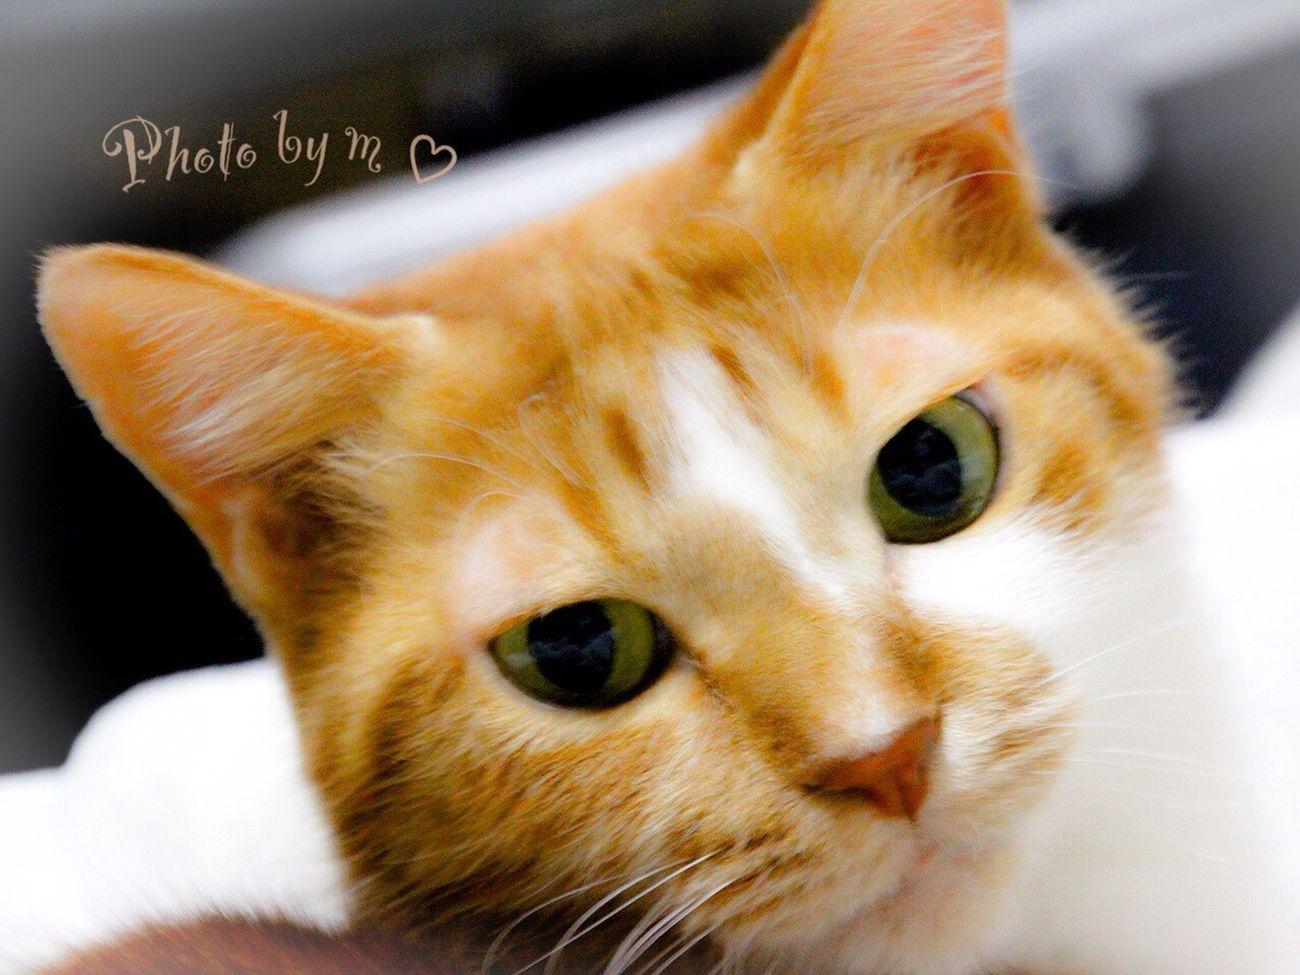 Mycat ウチの姫様 茶トラ猫 猫 Animal Cat Lovers Photography Cat♡ Cat 美猫